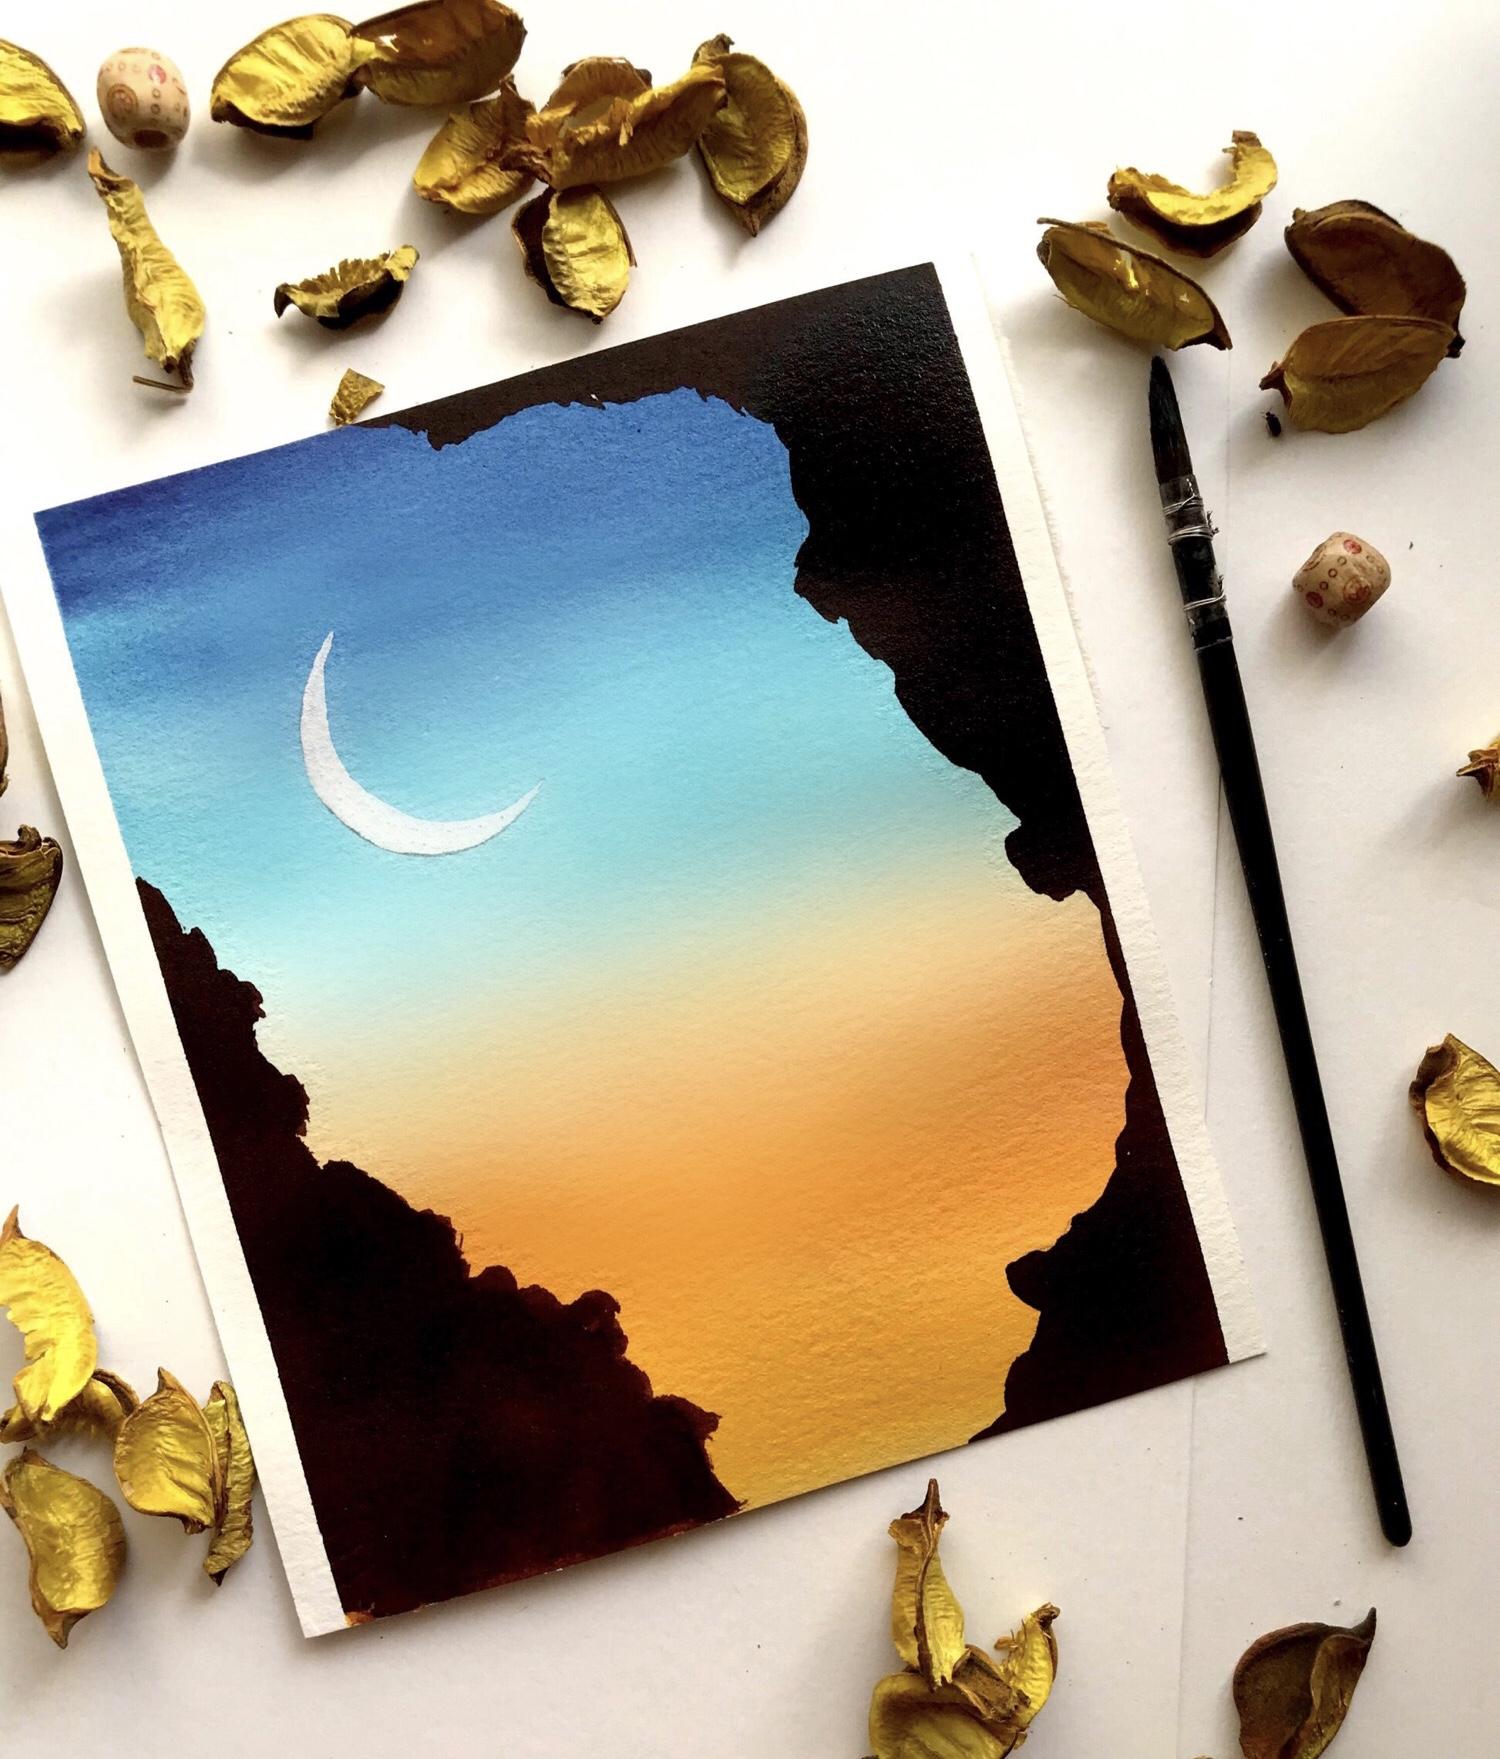 10 minute watercolour sunset tutorial